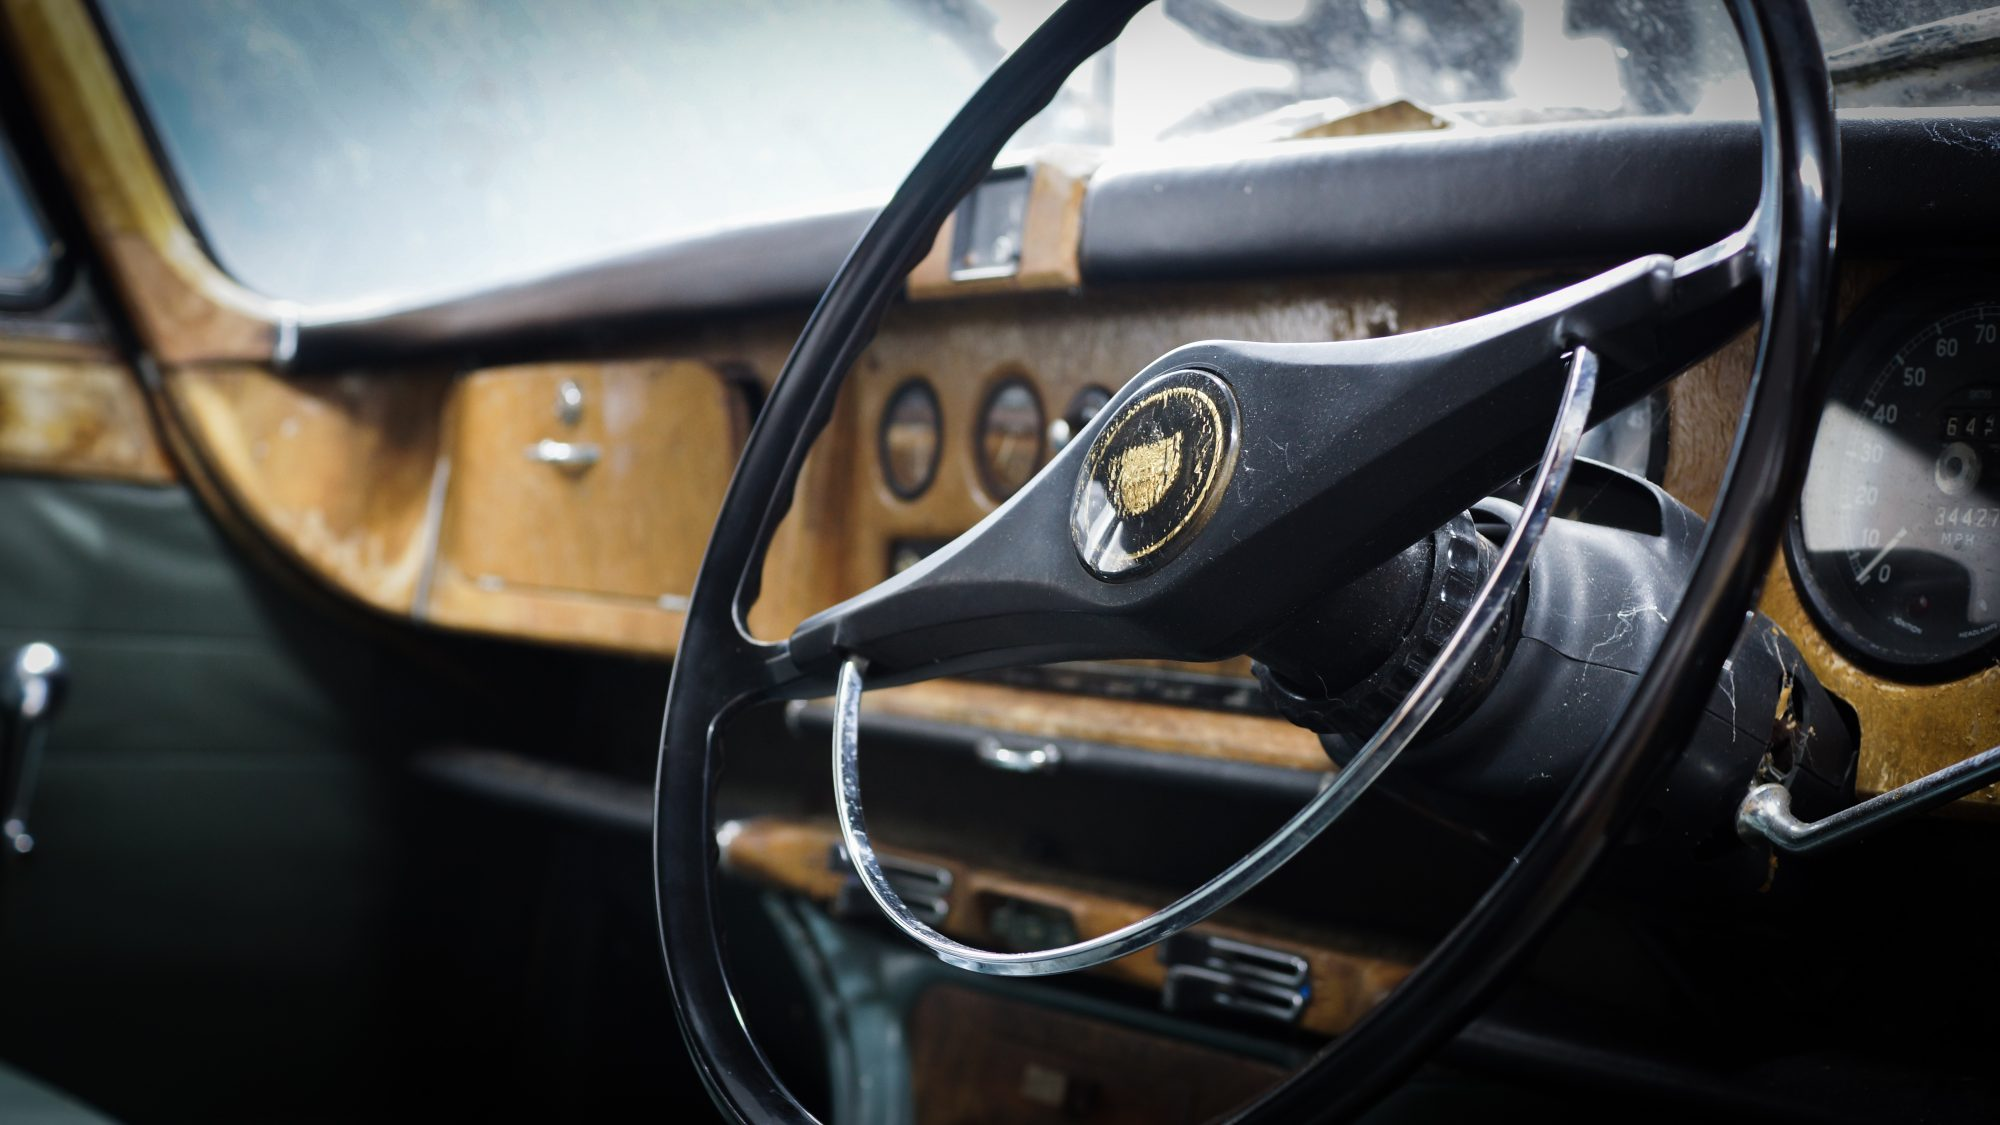 Jaguar, Jaguar 420G, 420G, The Krays, Ronnie and Reggie Kray, steering wheel